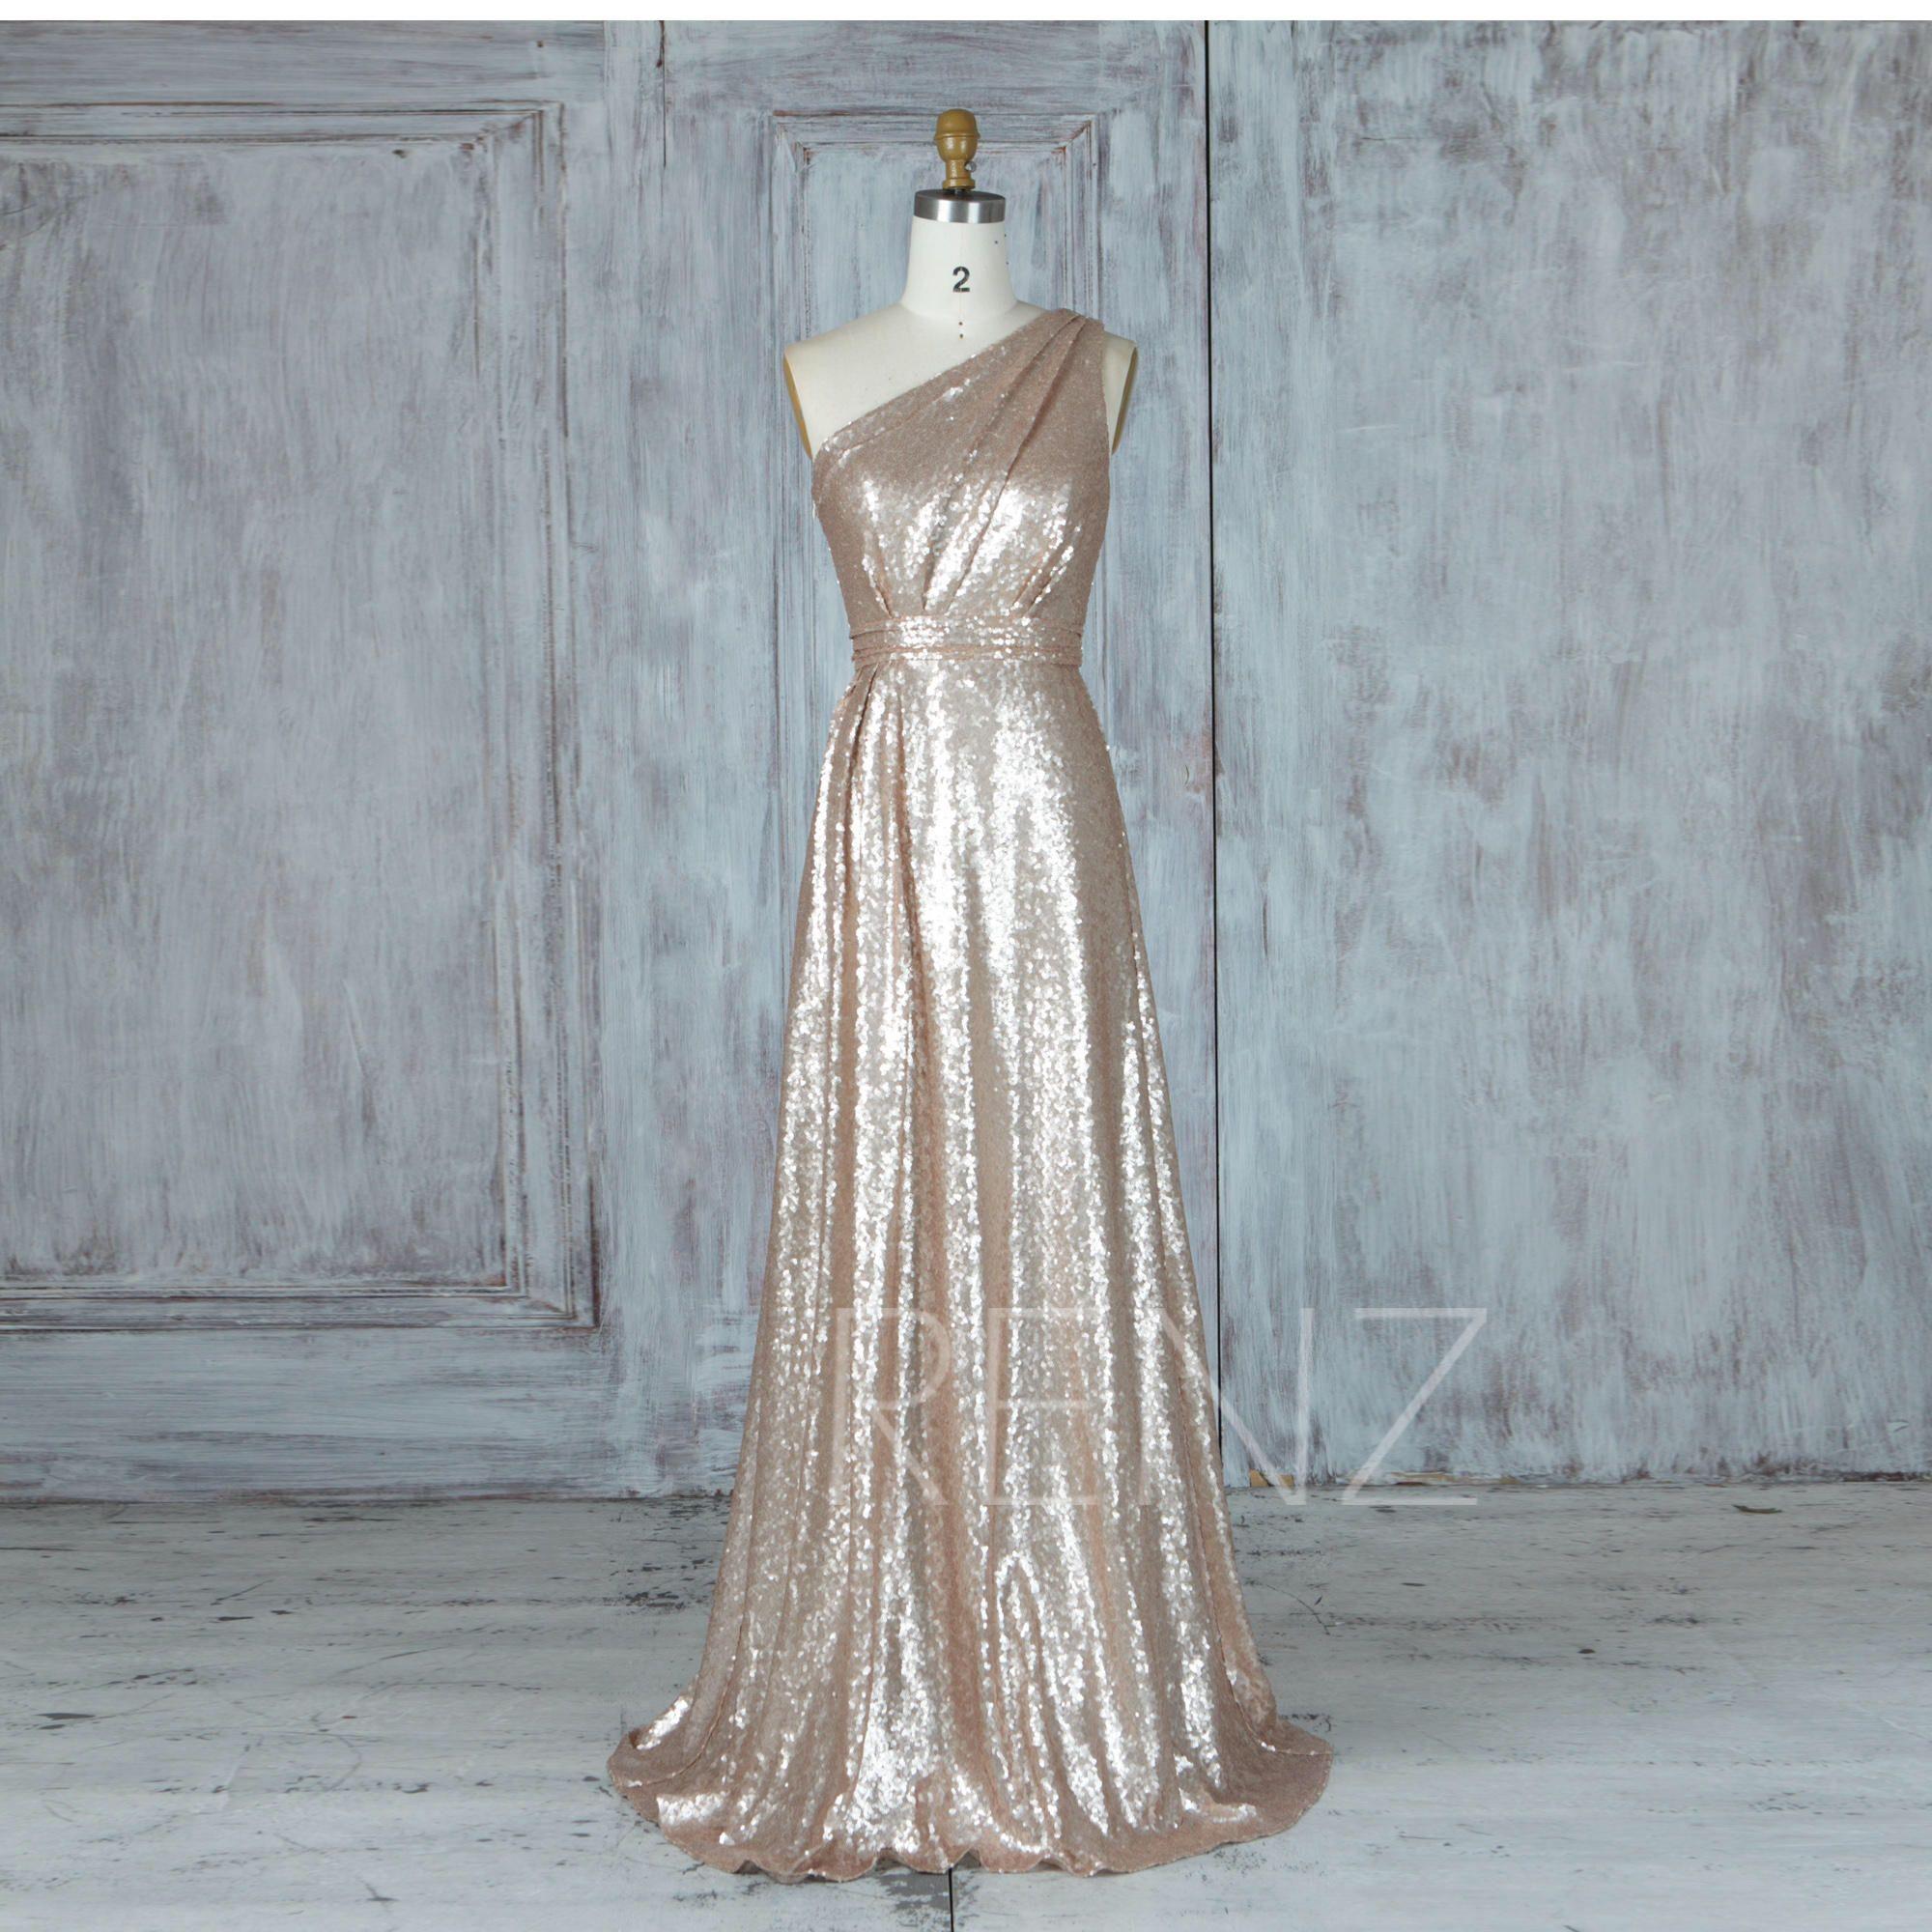 Bridesmaid Dress Tan Sequin Wedding Dress,Ruched One Shoulder ...